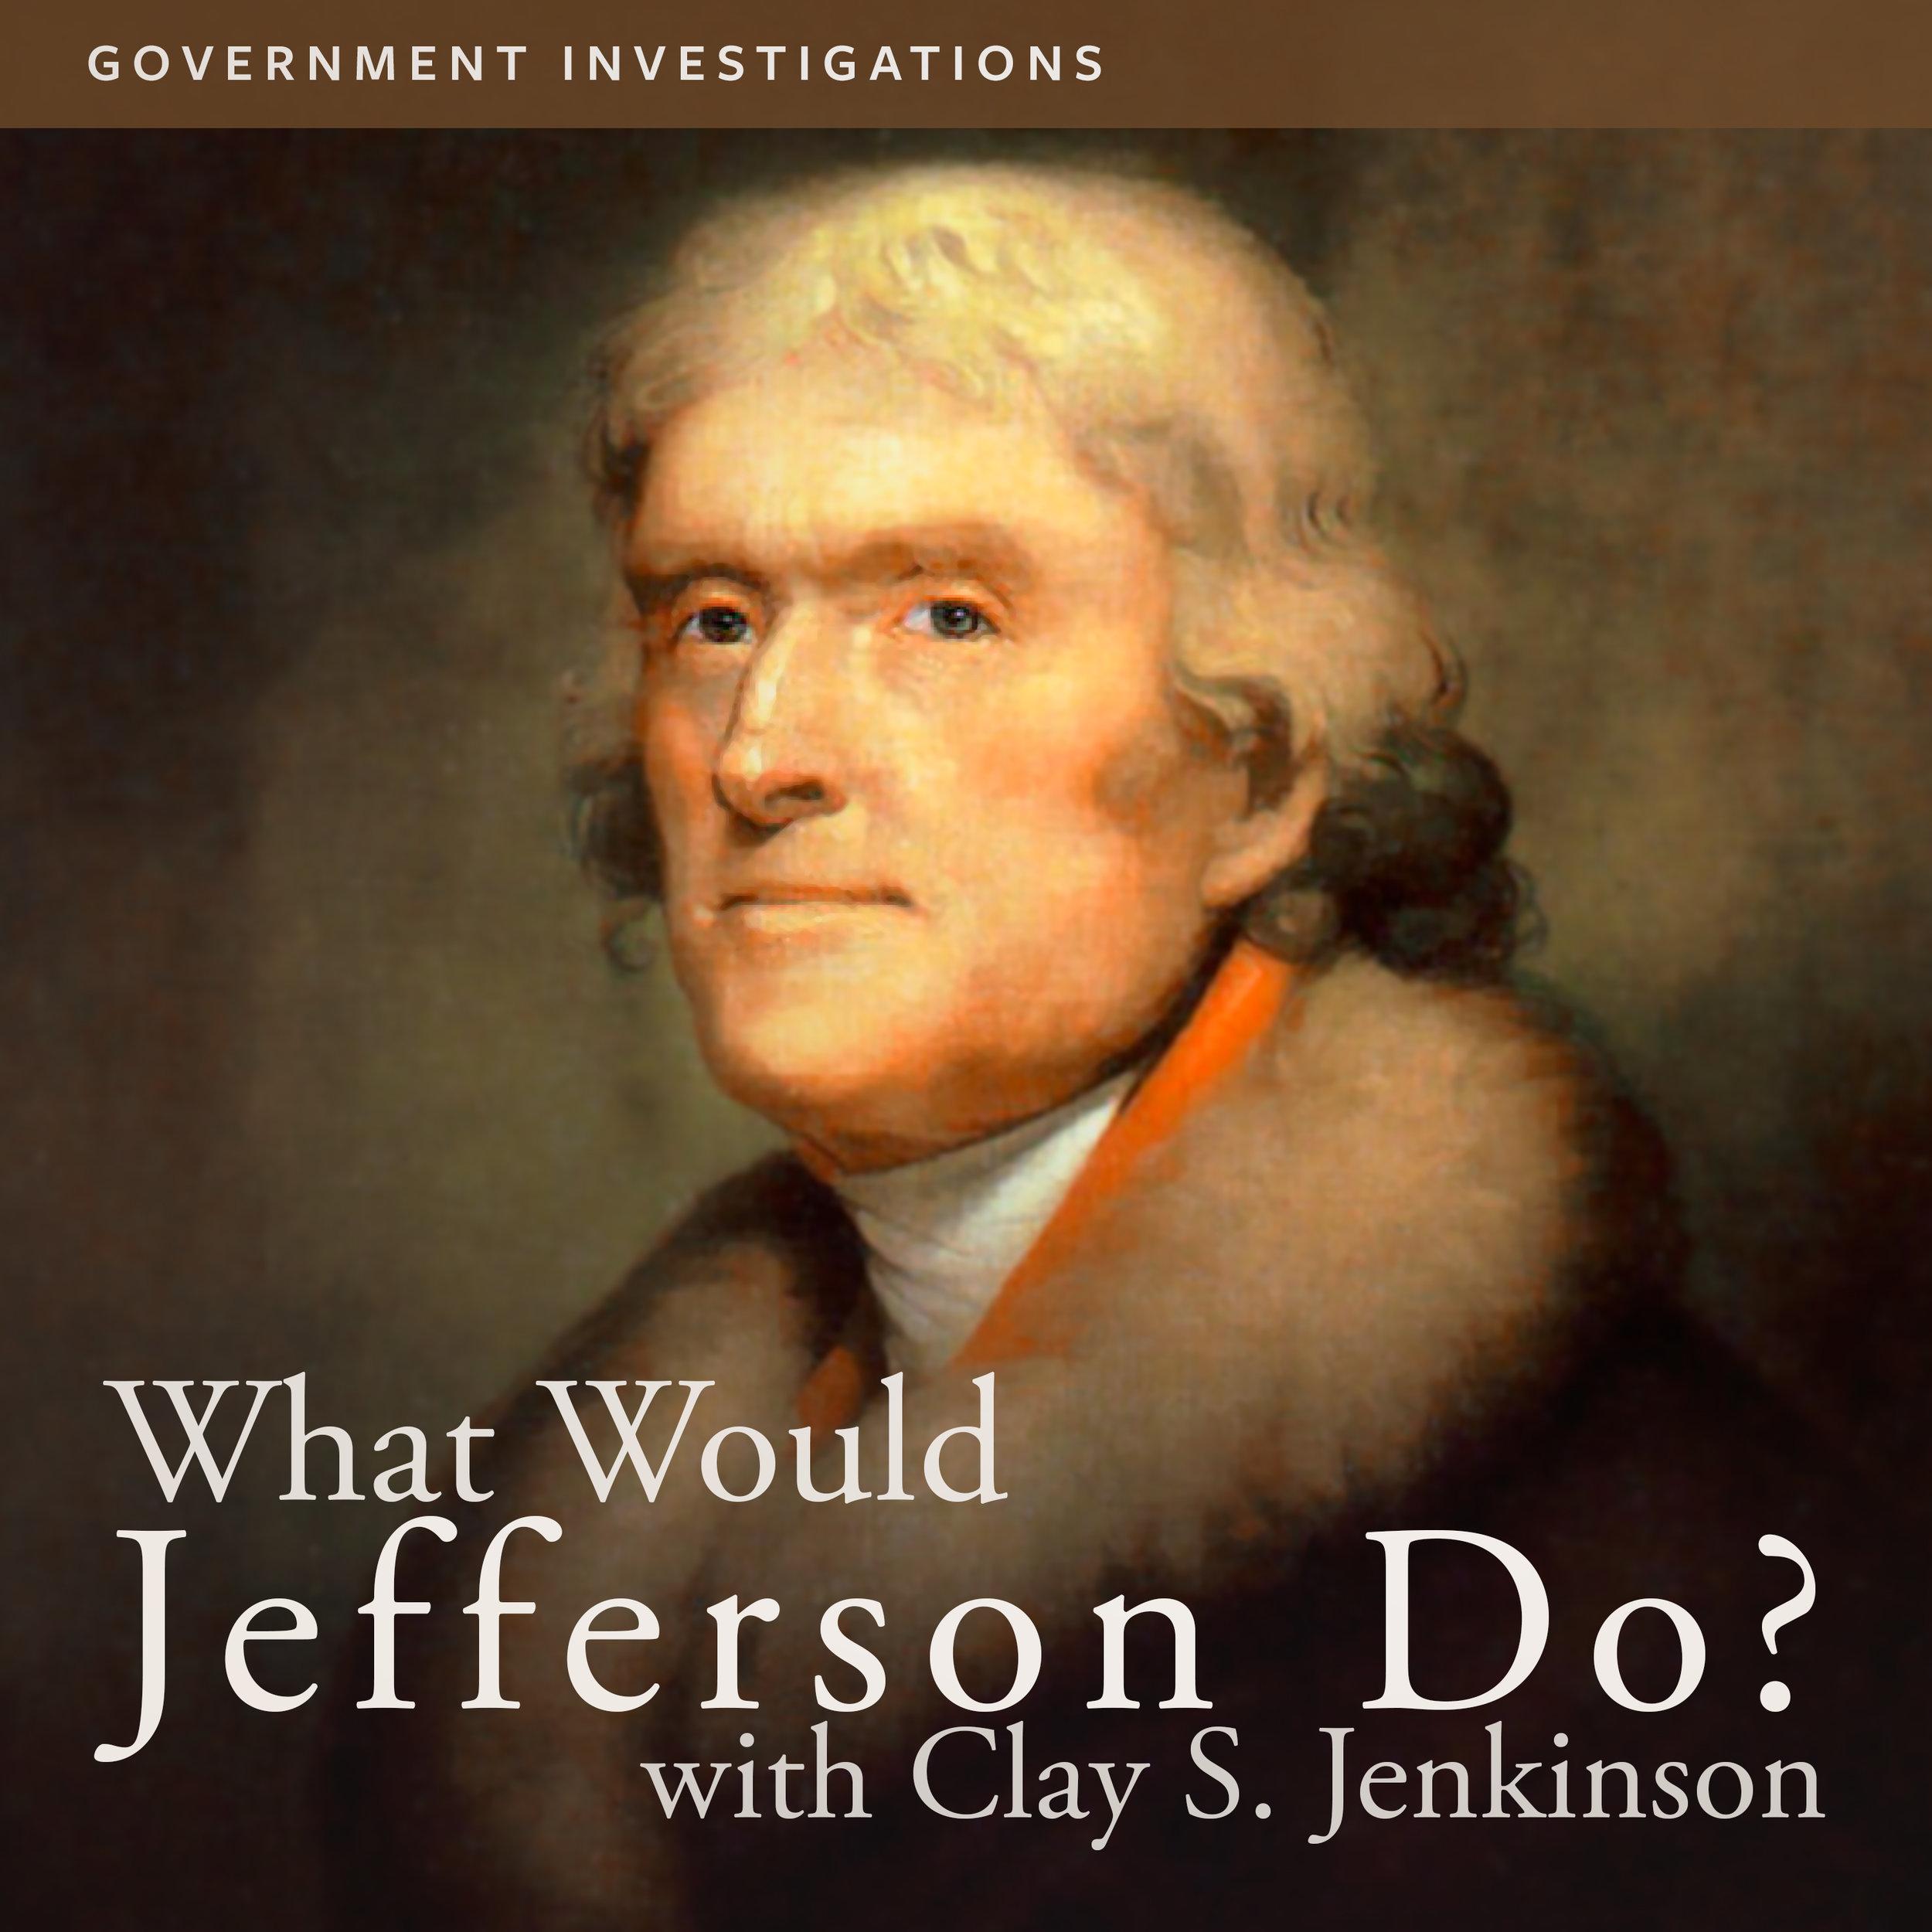 WWTJD_1291 Government Investigations.jpg